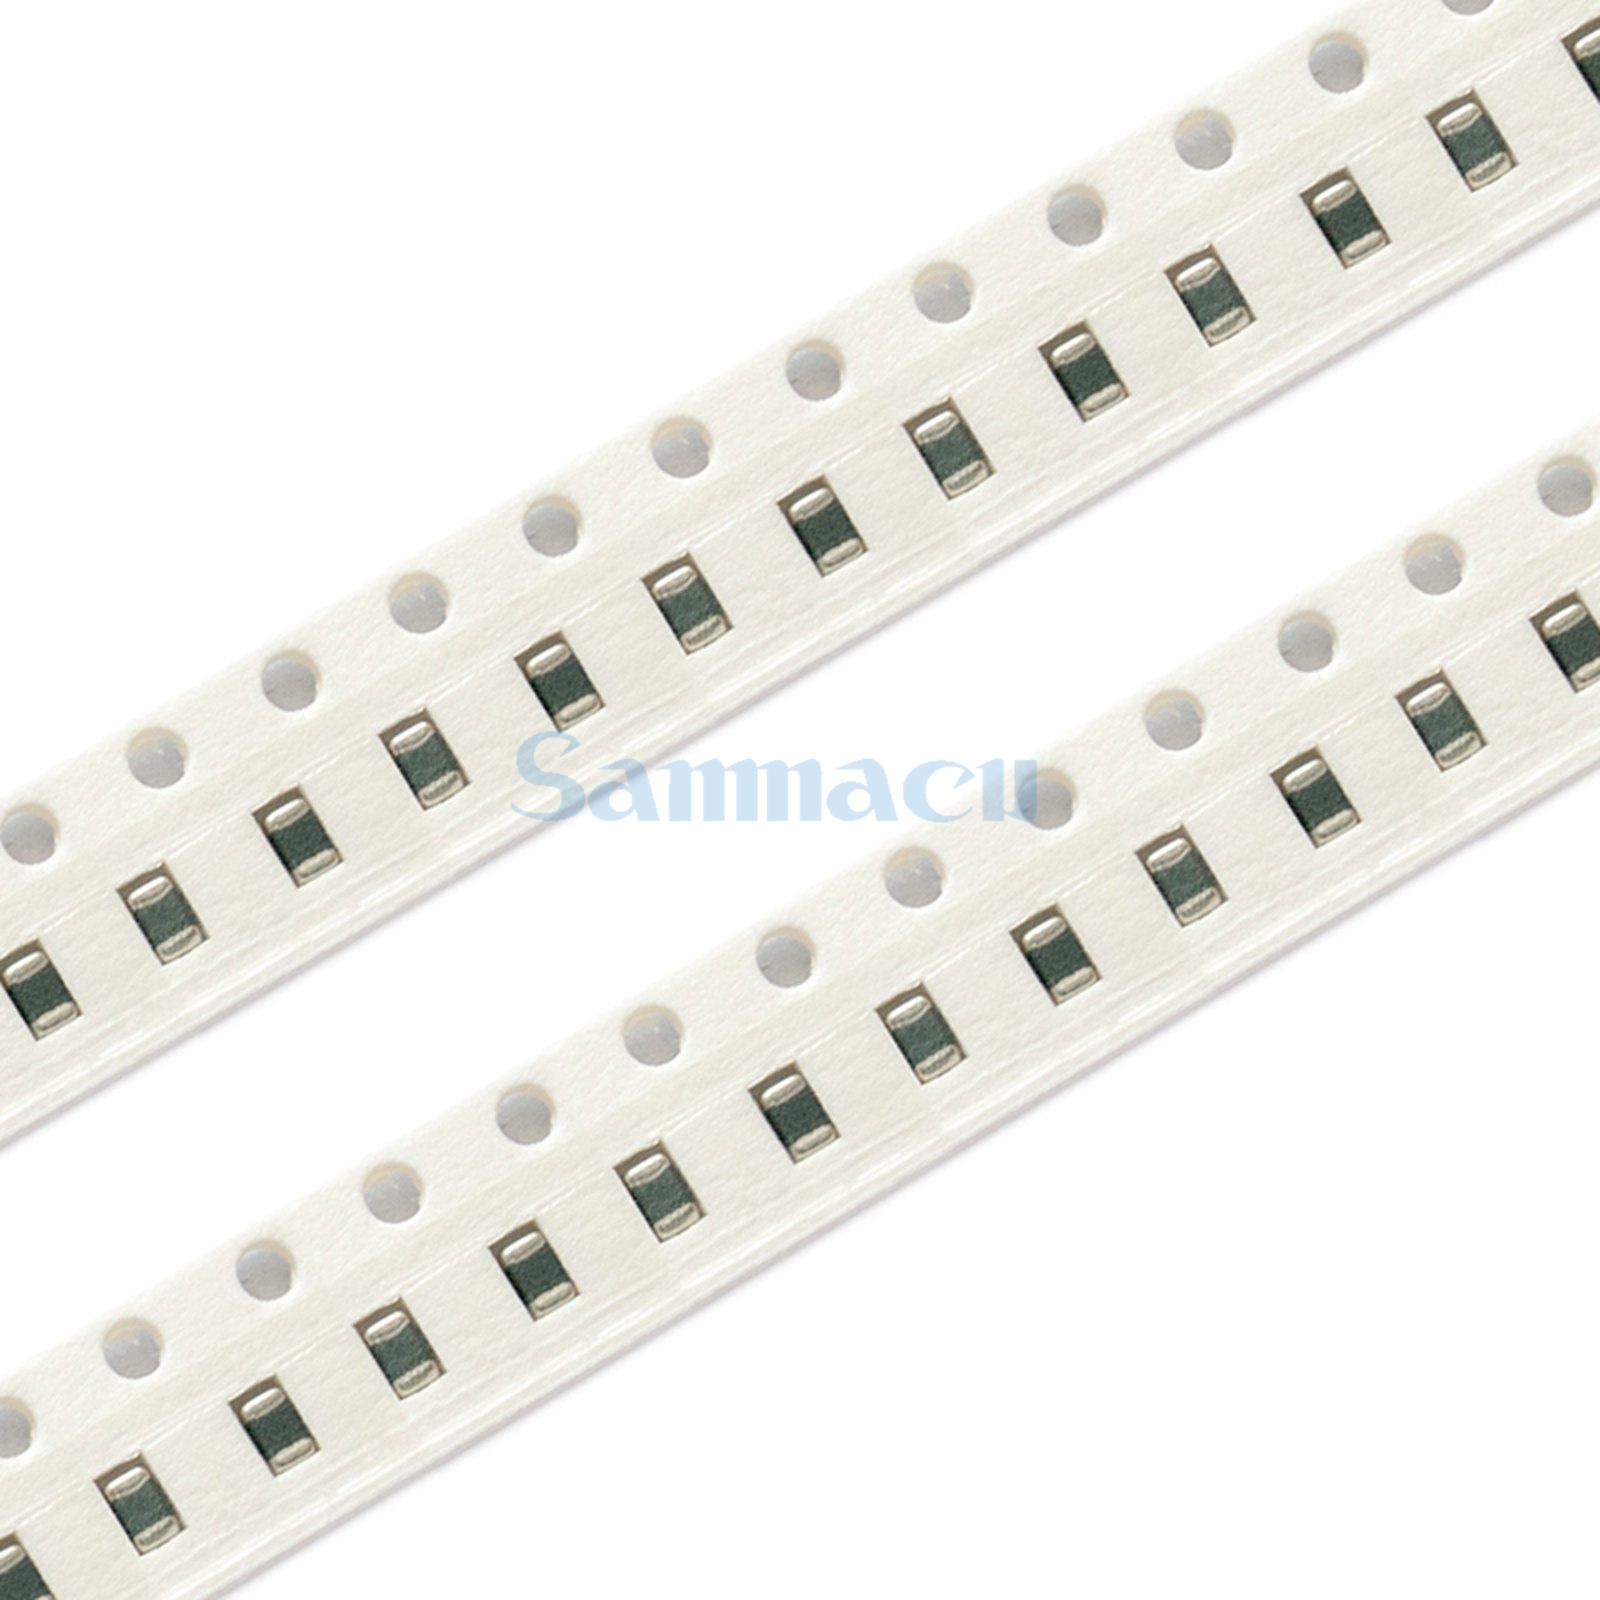 100pc Voltage Regulator DIP IC LM78L12 78L12 TO-92 12V 100mA HTC Korea RoHS